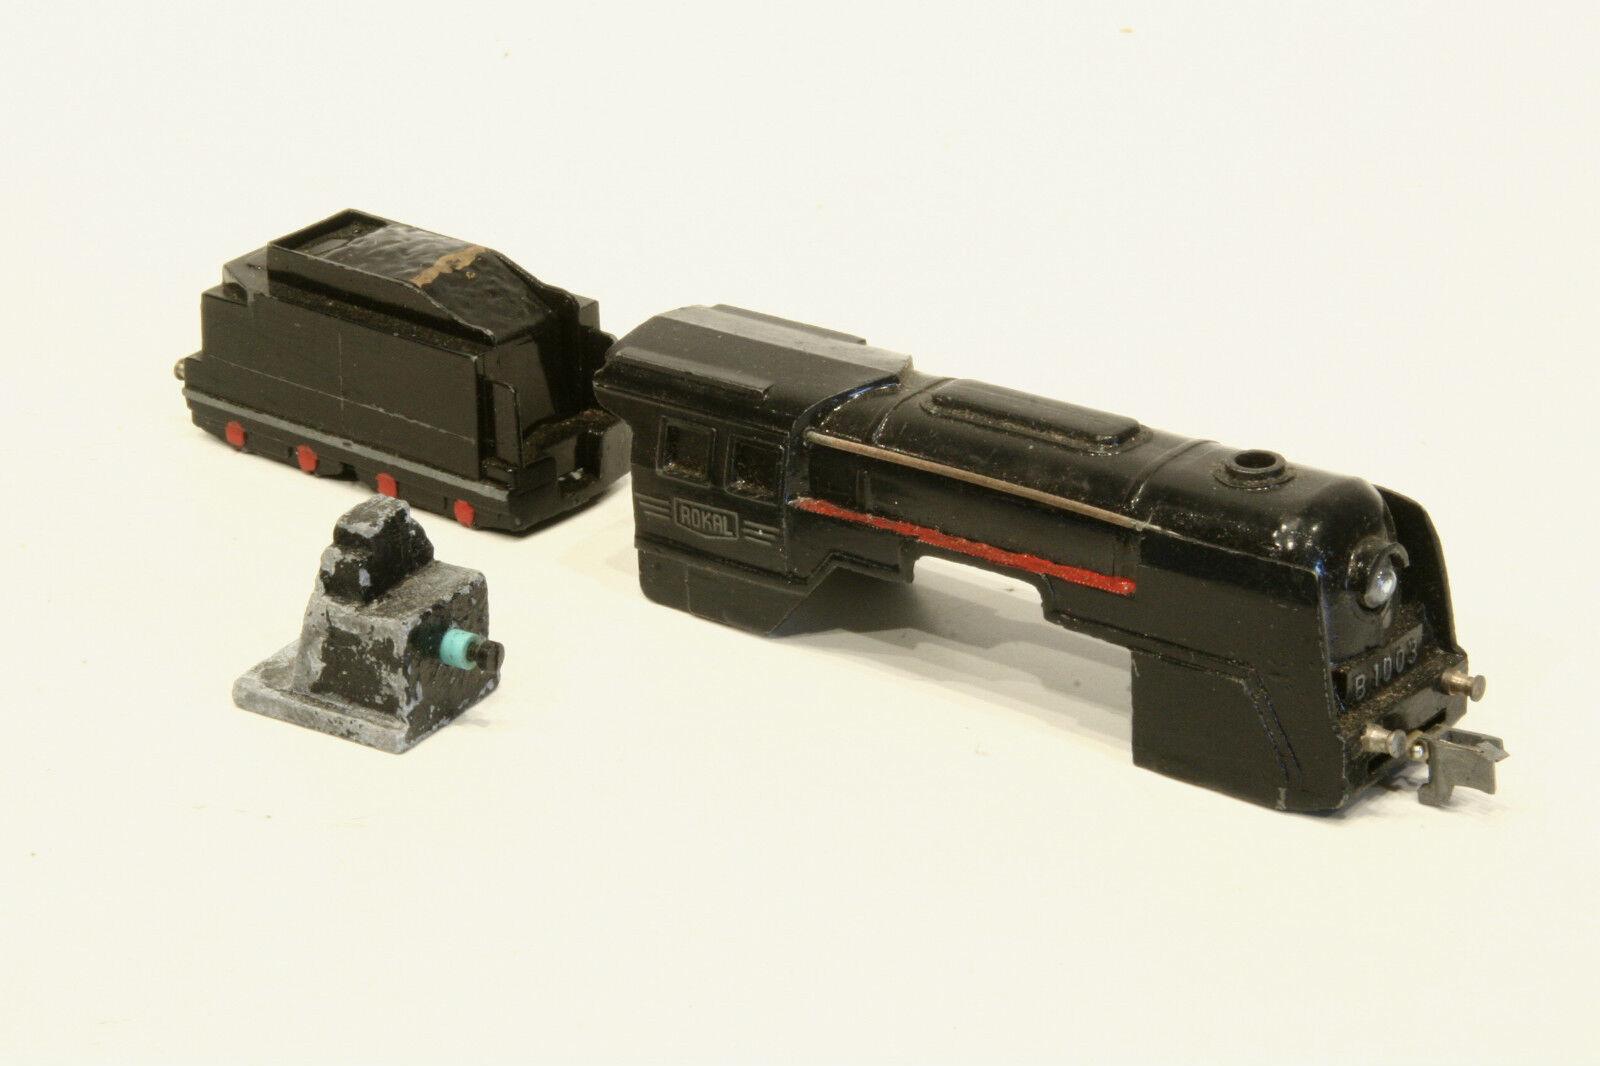 ROKAL TT B 1003 chassis per locomotiva e tender, locomotiva chassis, molto bella